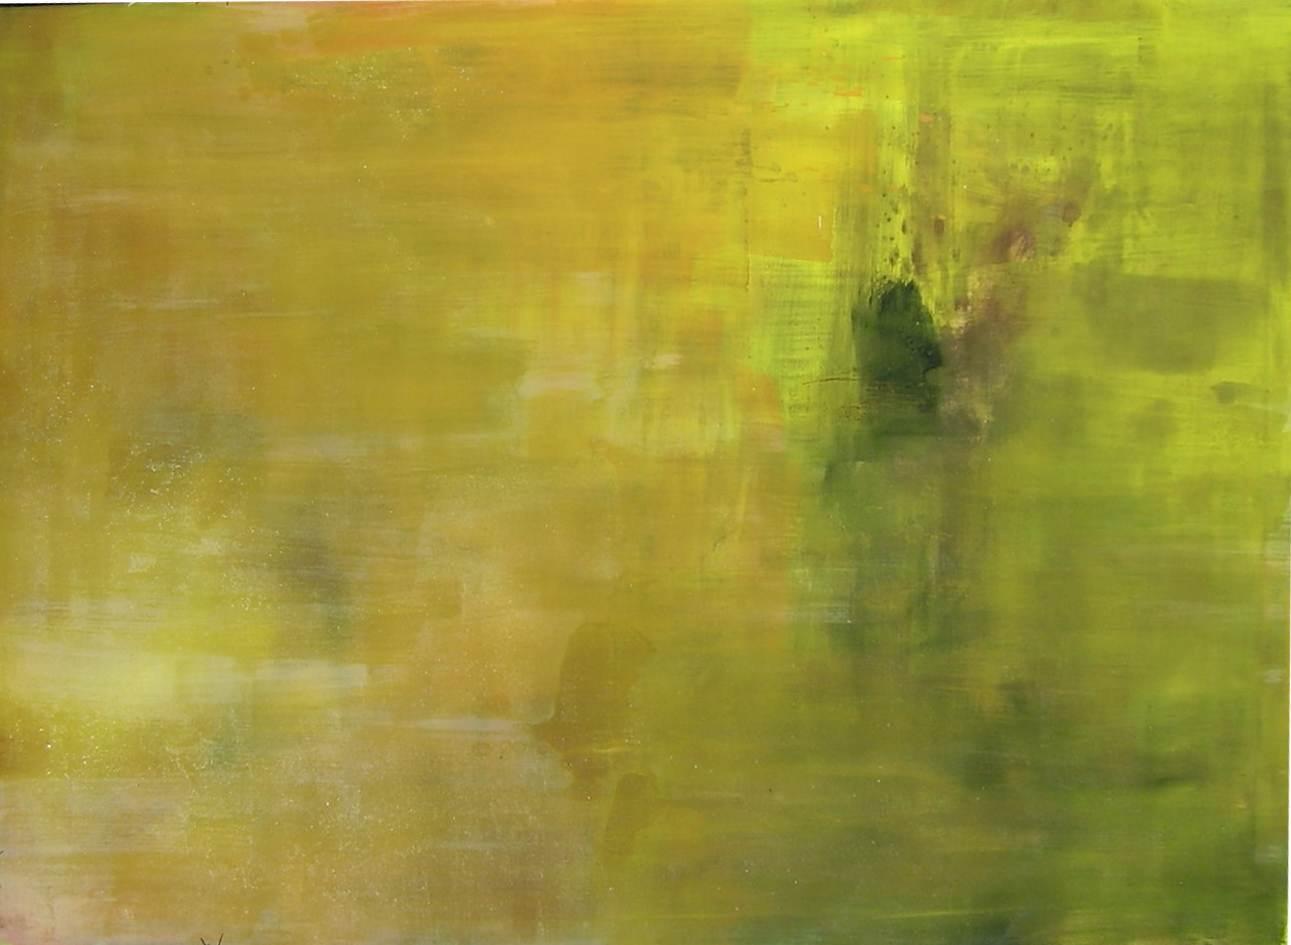 Untitled (yellow), 2006